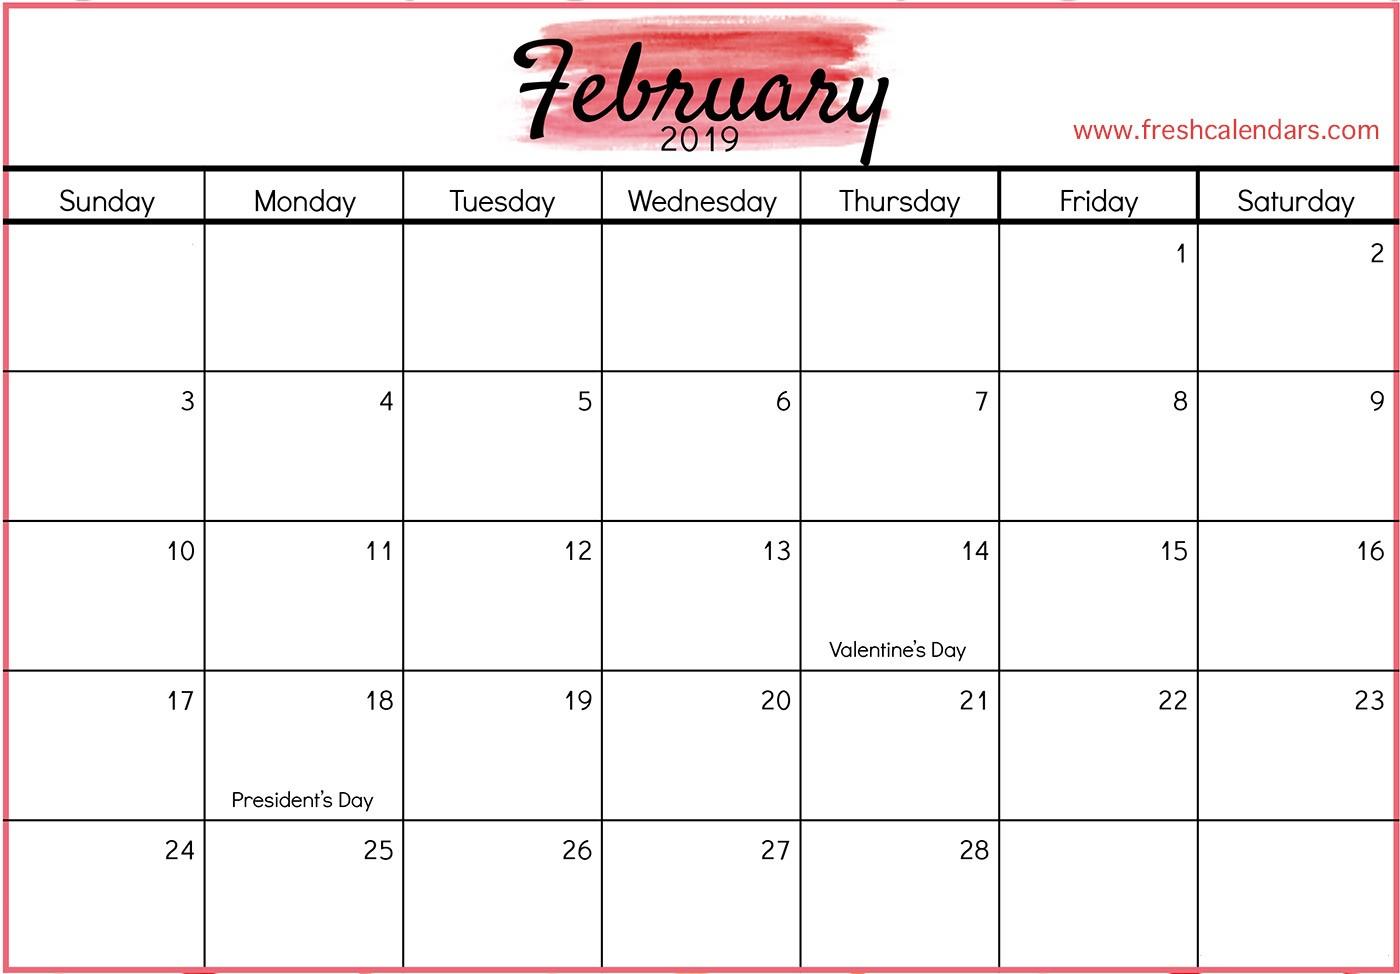 Feb 2019 Calendar Printable Blank February 2019 Calendar Printable Templates